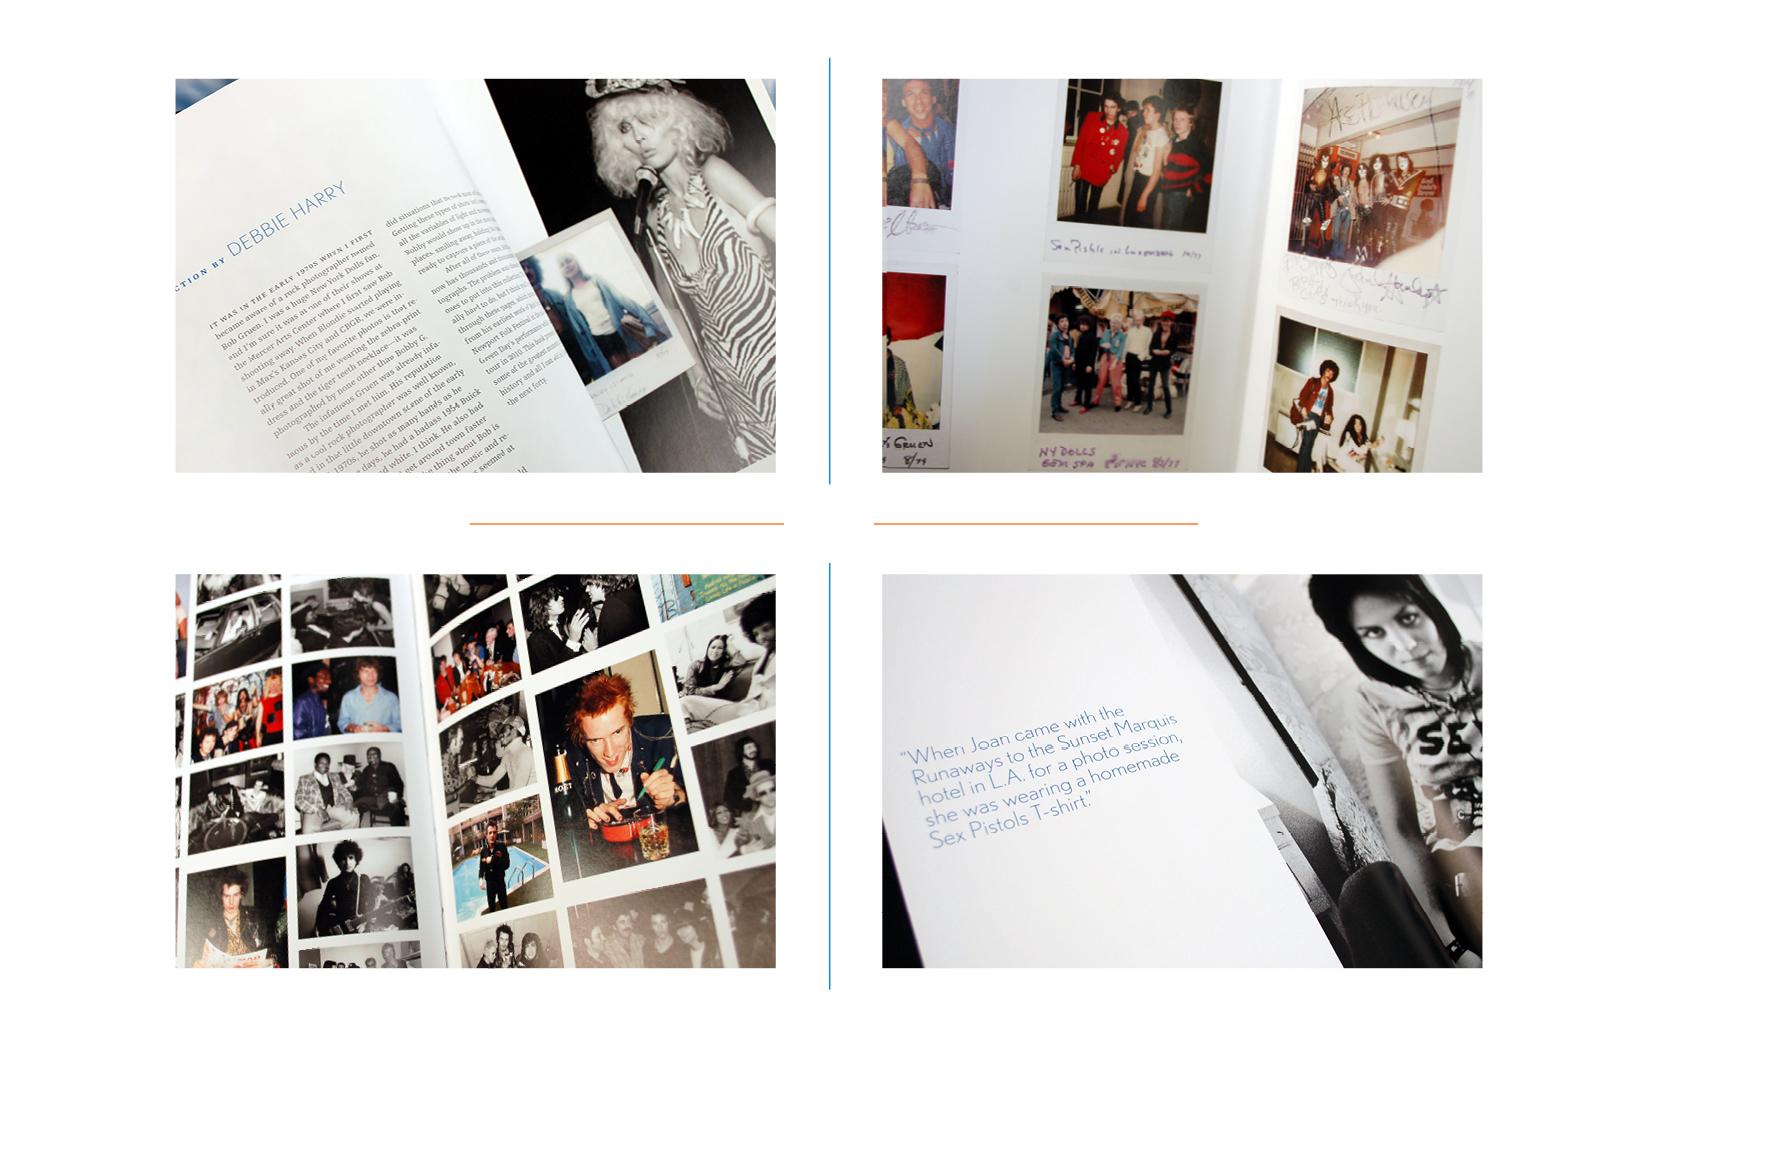 Interior details -  Foreword // Polaroids// Photo grid // Author's comment